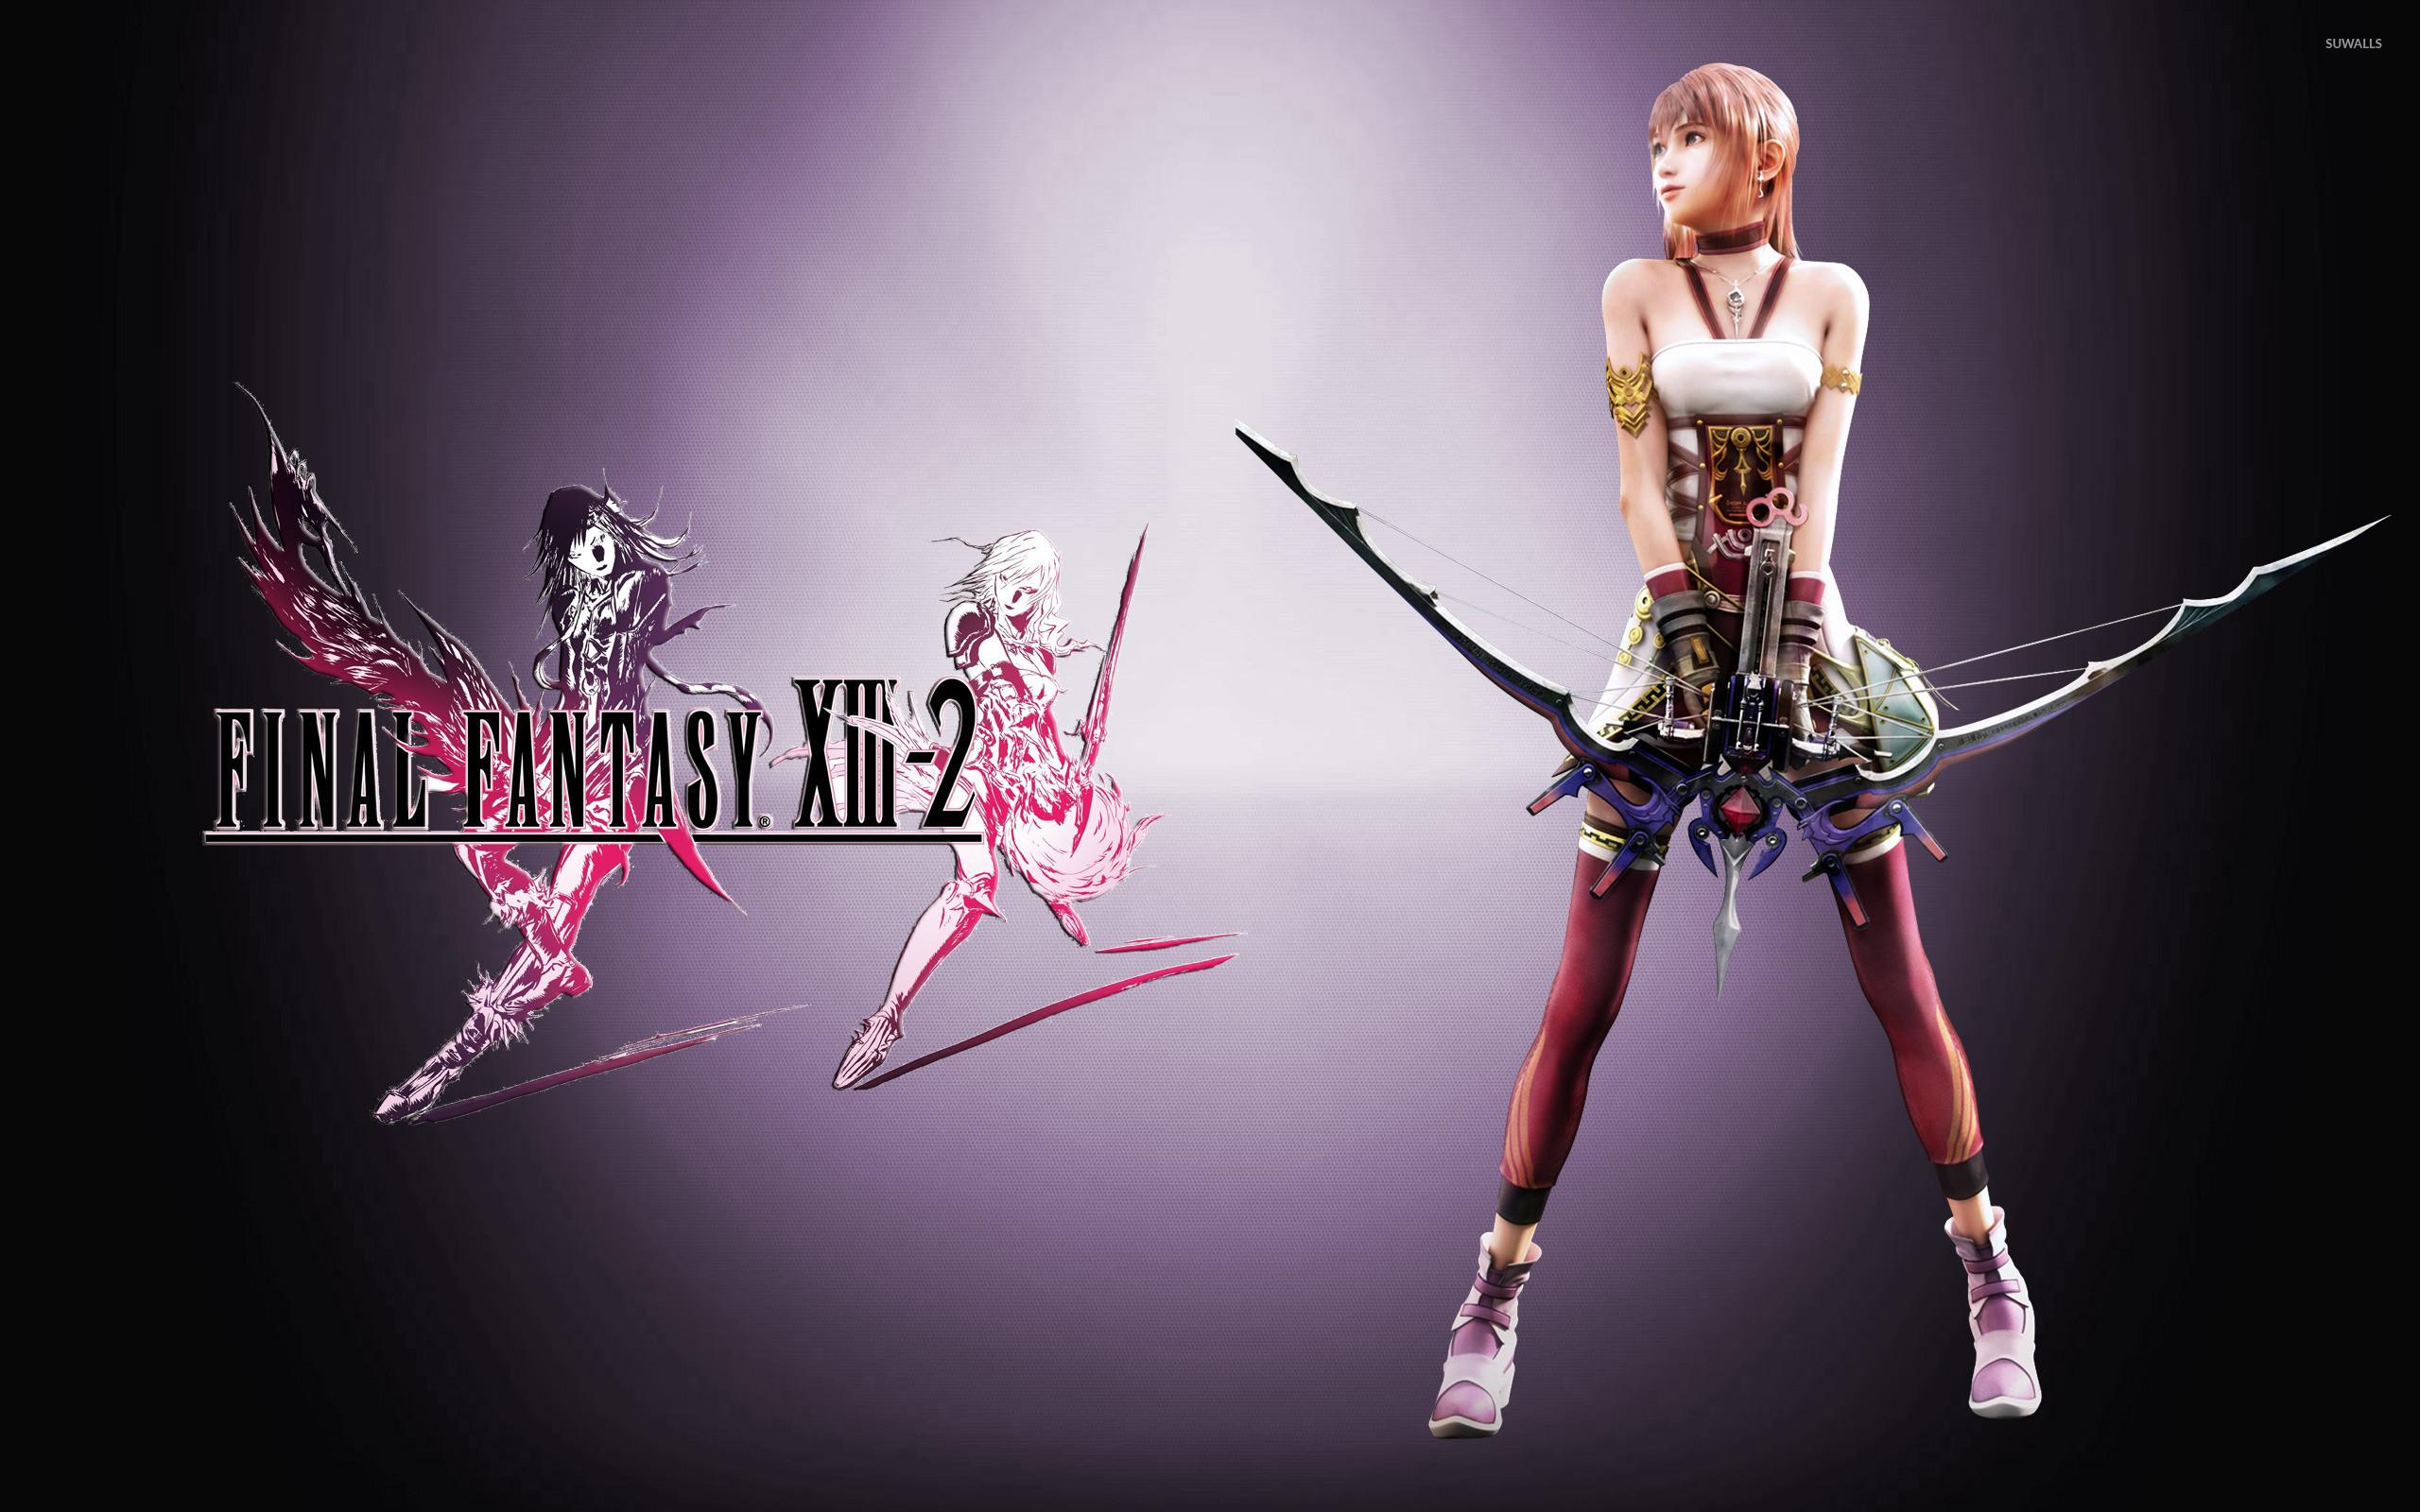 Final Fantasy 13 2 Wallpaper: Final Fantasy XIII 2 Wallpaper (88+ Images